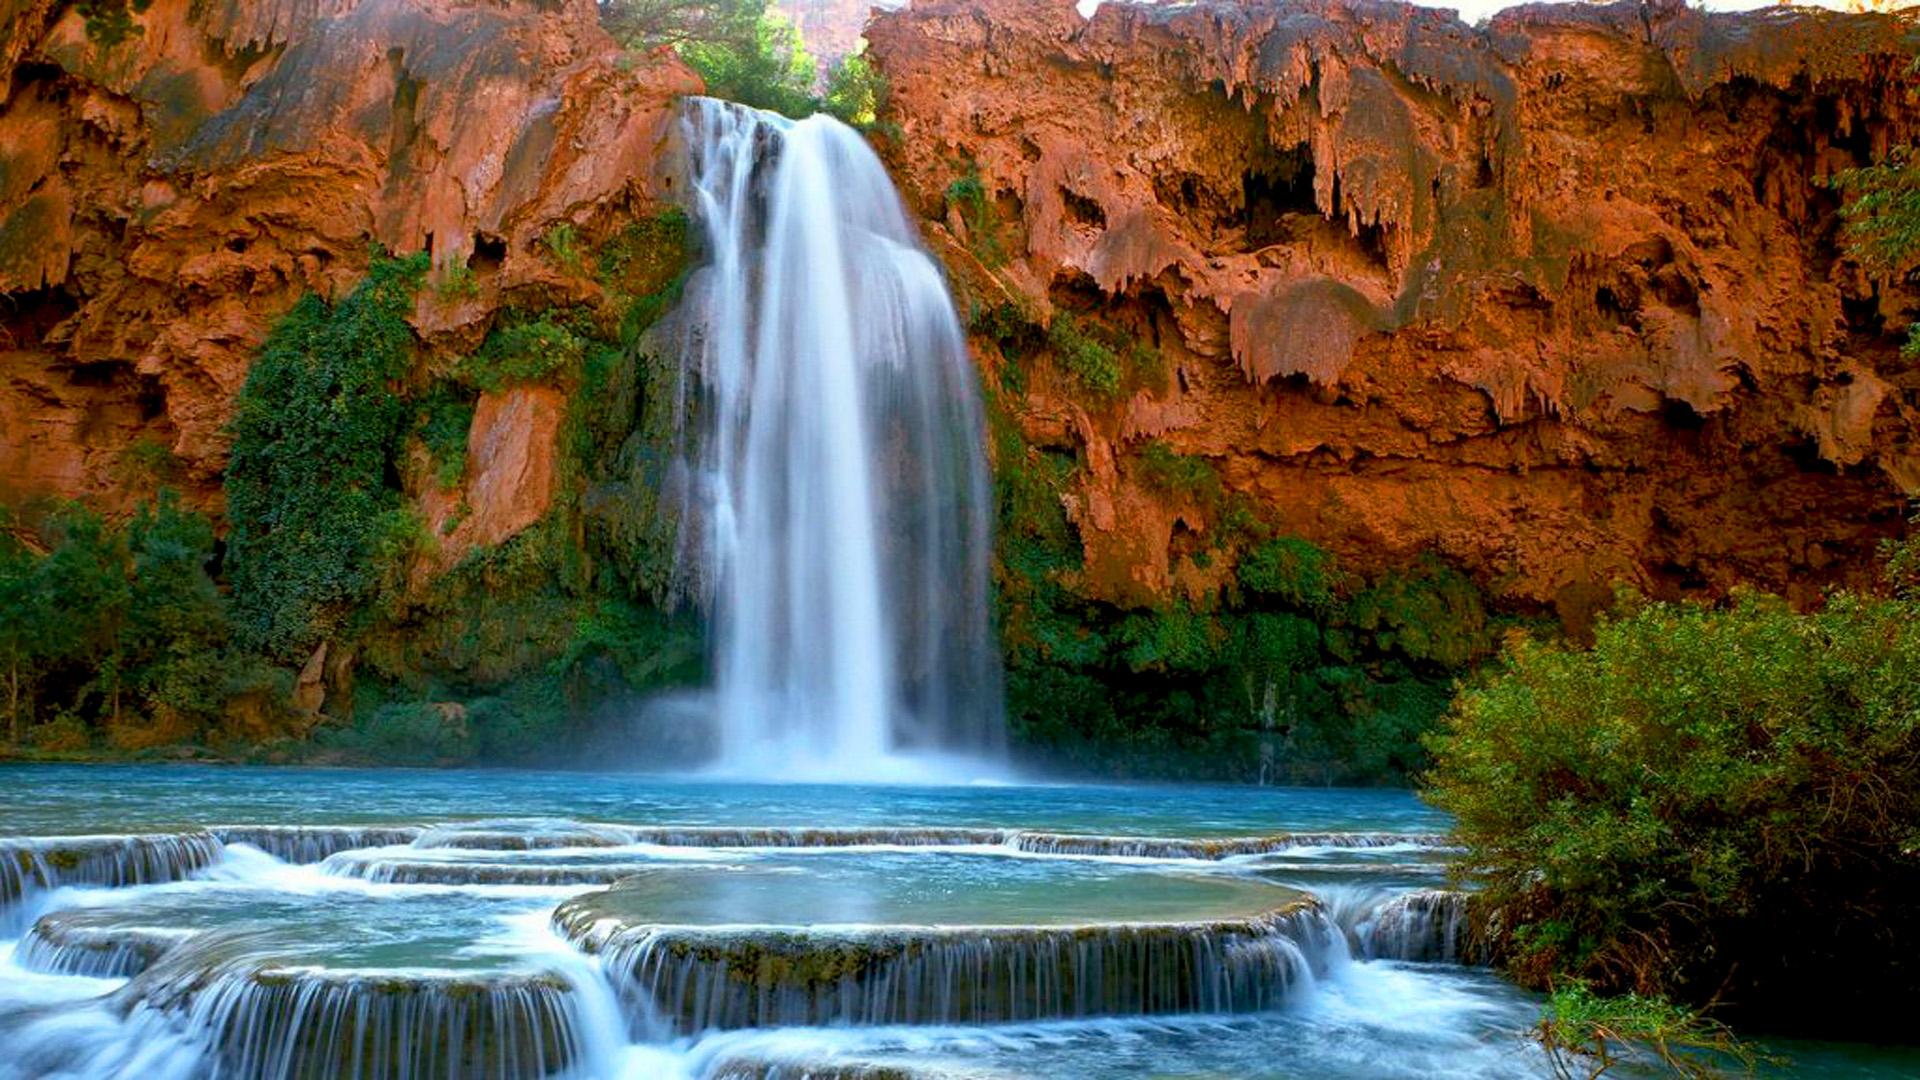 With gerhard steyn, marisa drummond, hykie berg, johan scholtz. Havasu Falls Havasupai Arizona U S Desktop Hd Wallpaper